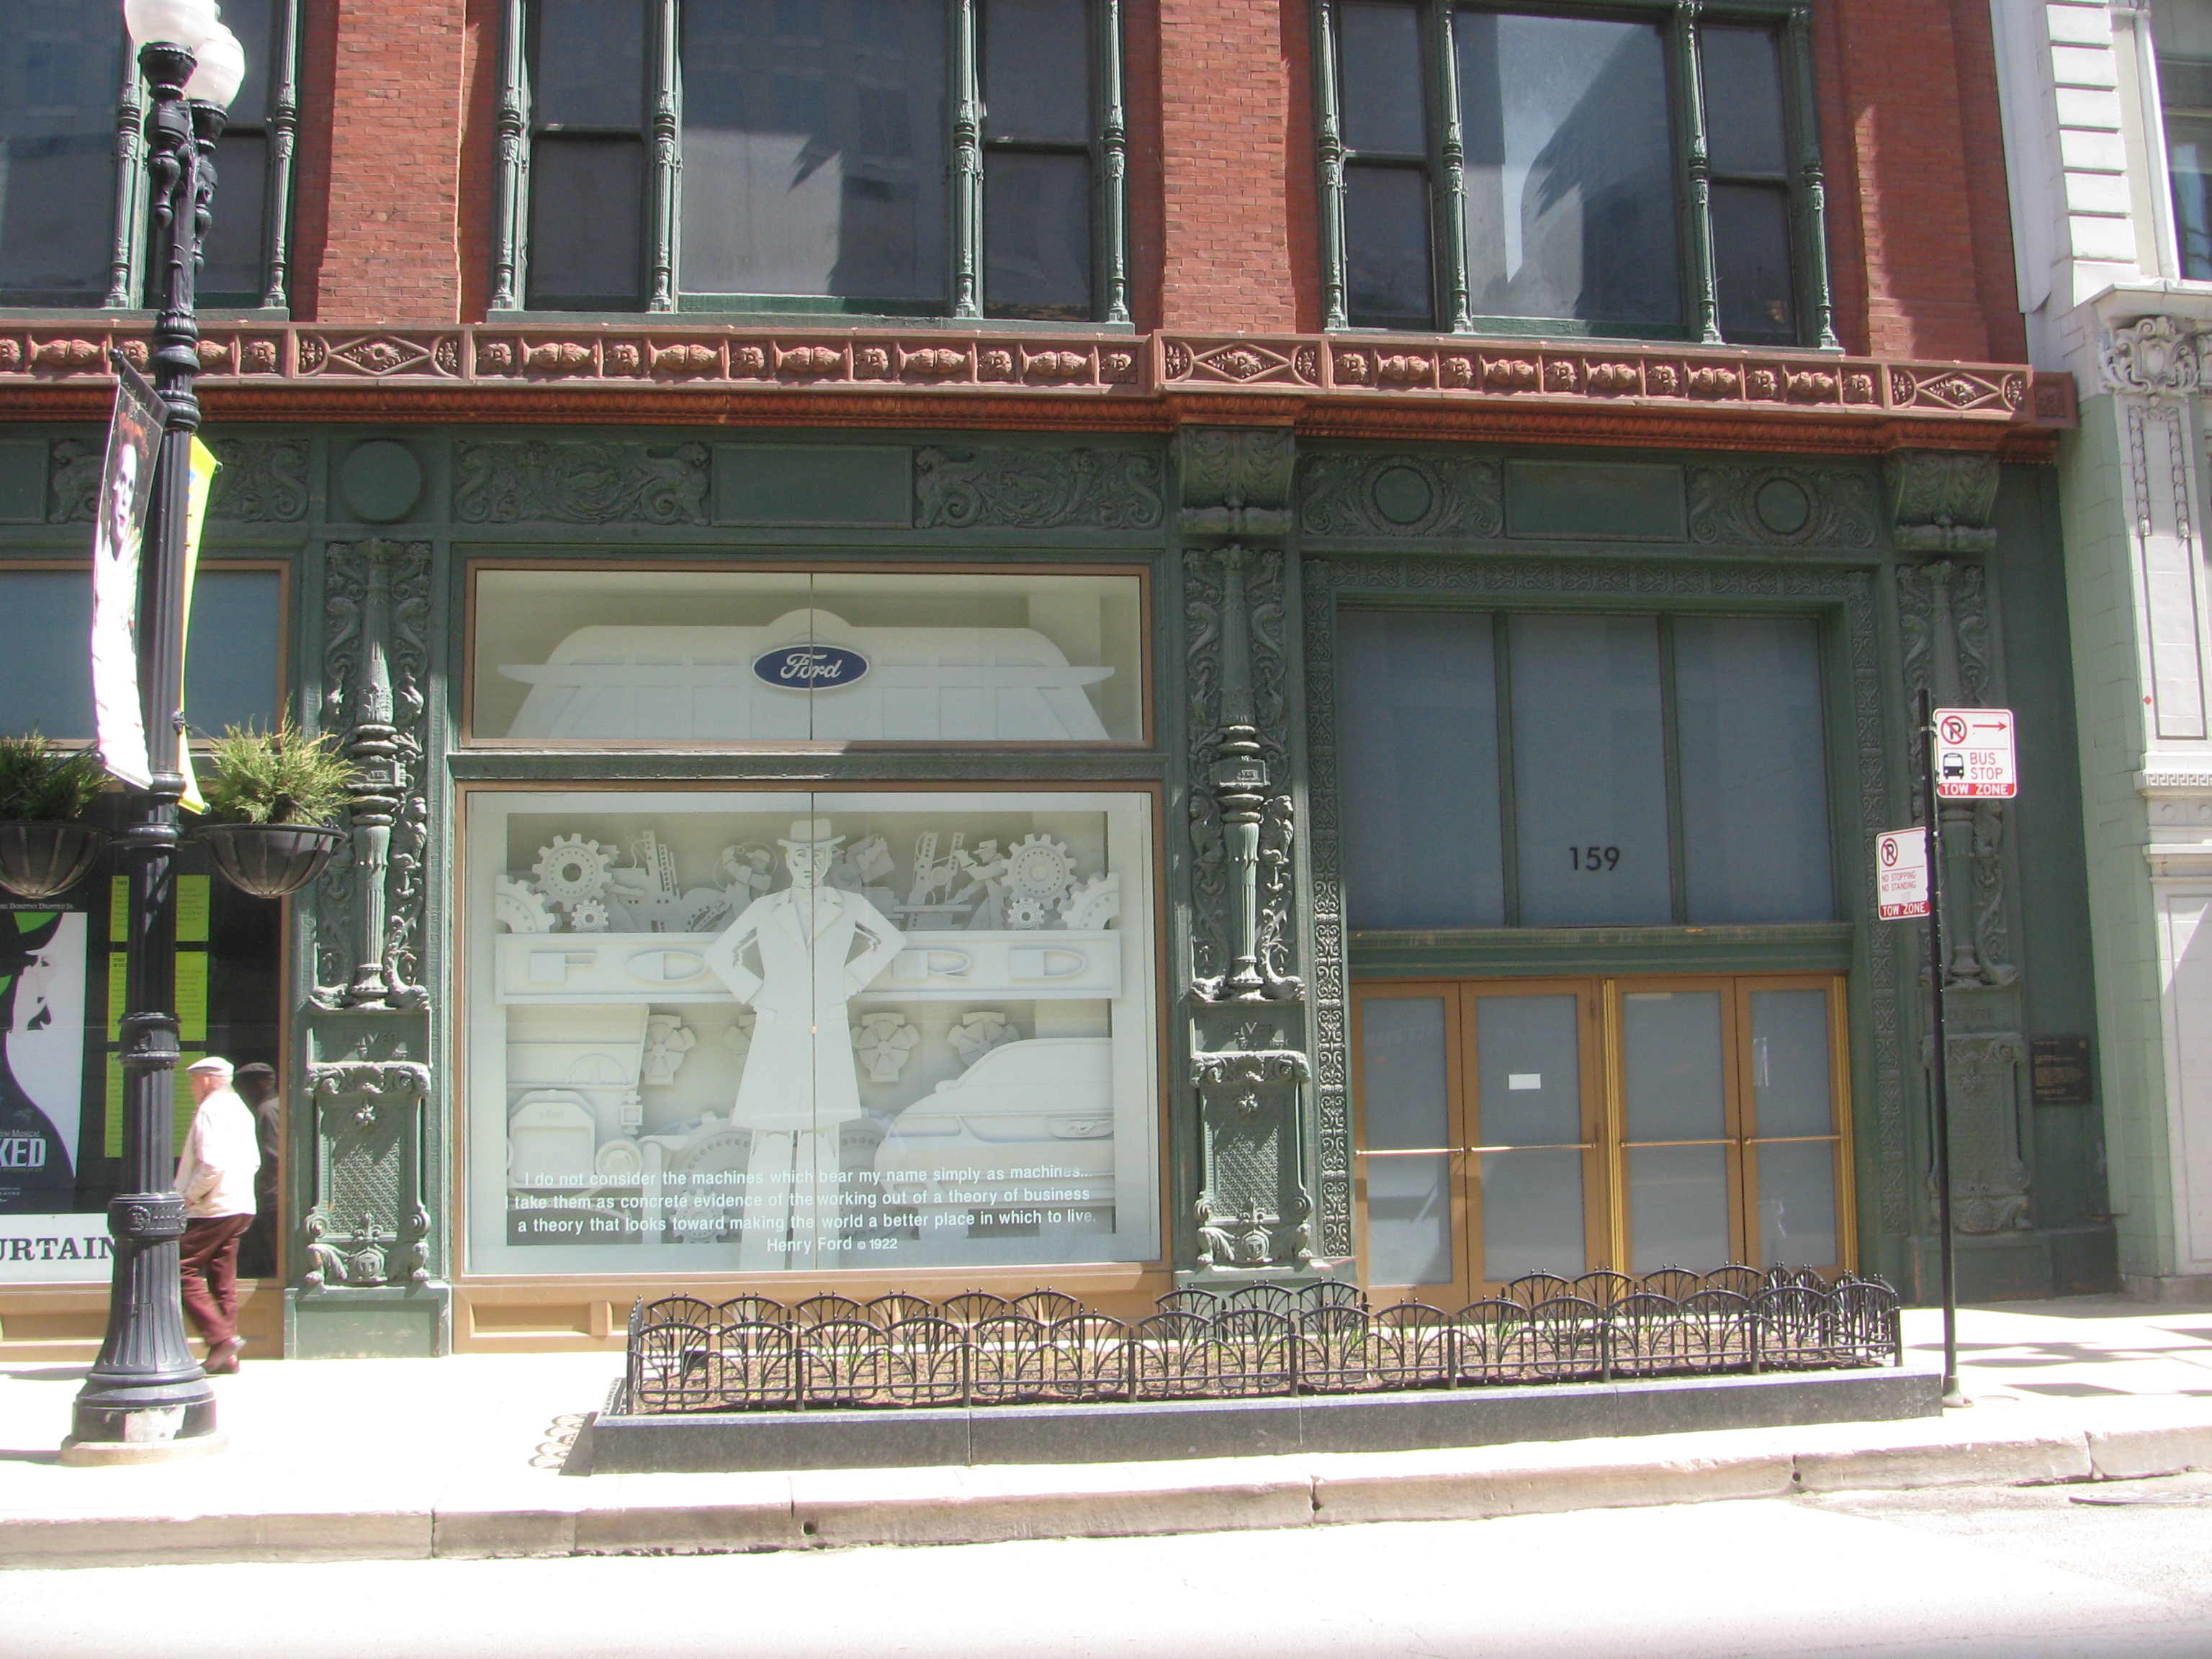 File oliver typewriter building front door and design jpg for Building main door designs